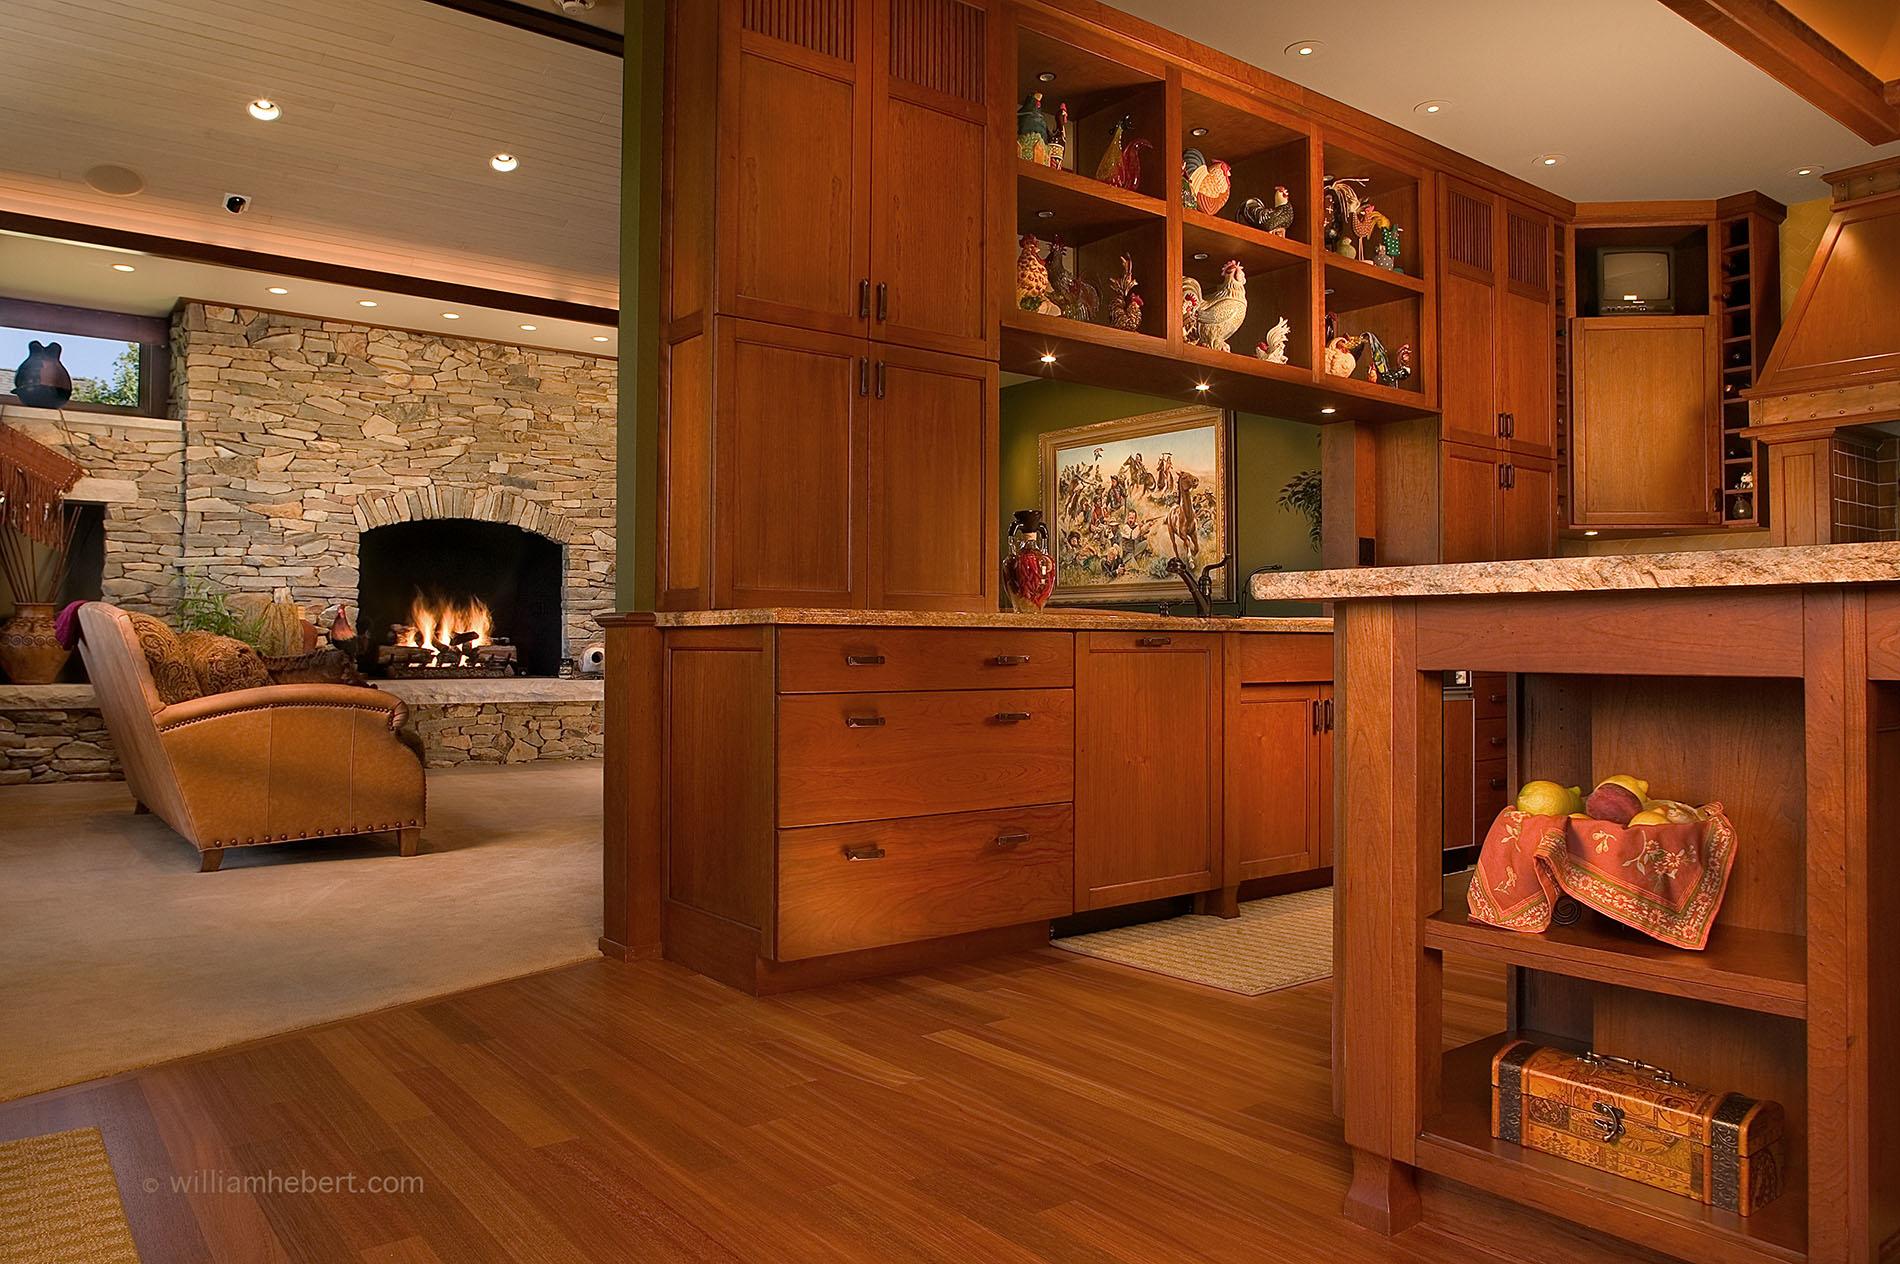 Architecture_Interior_45.jpg